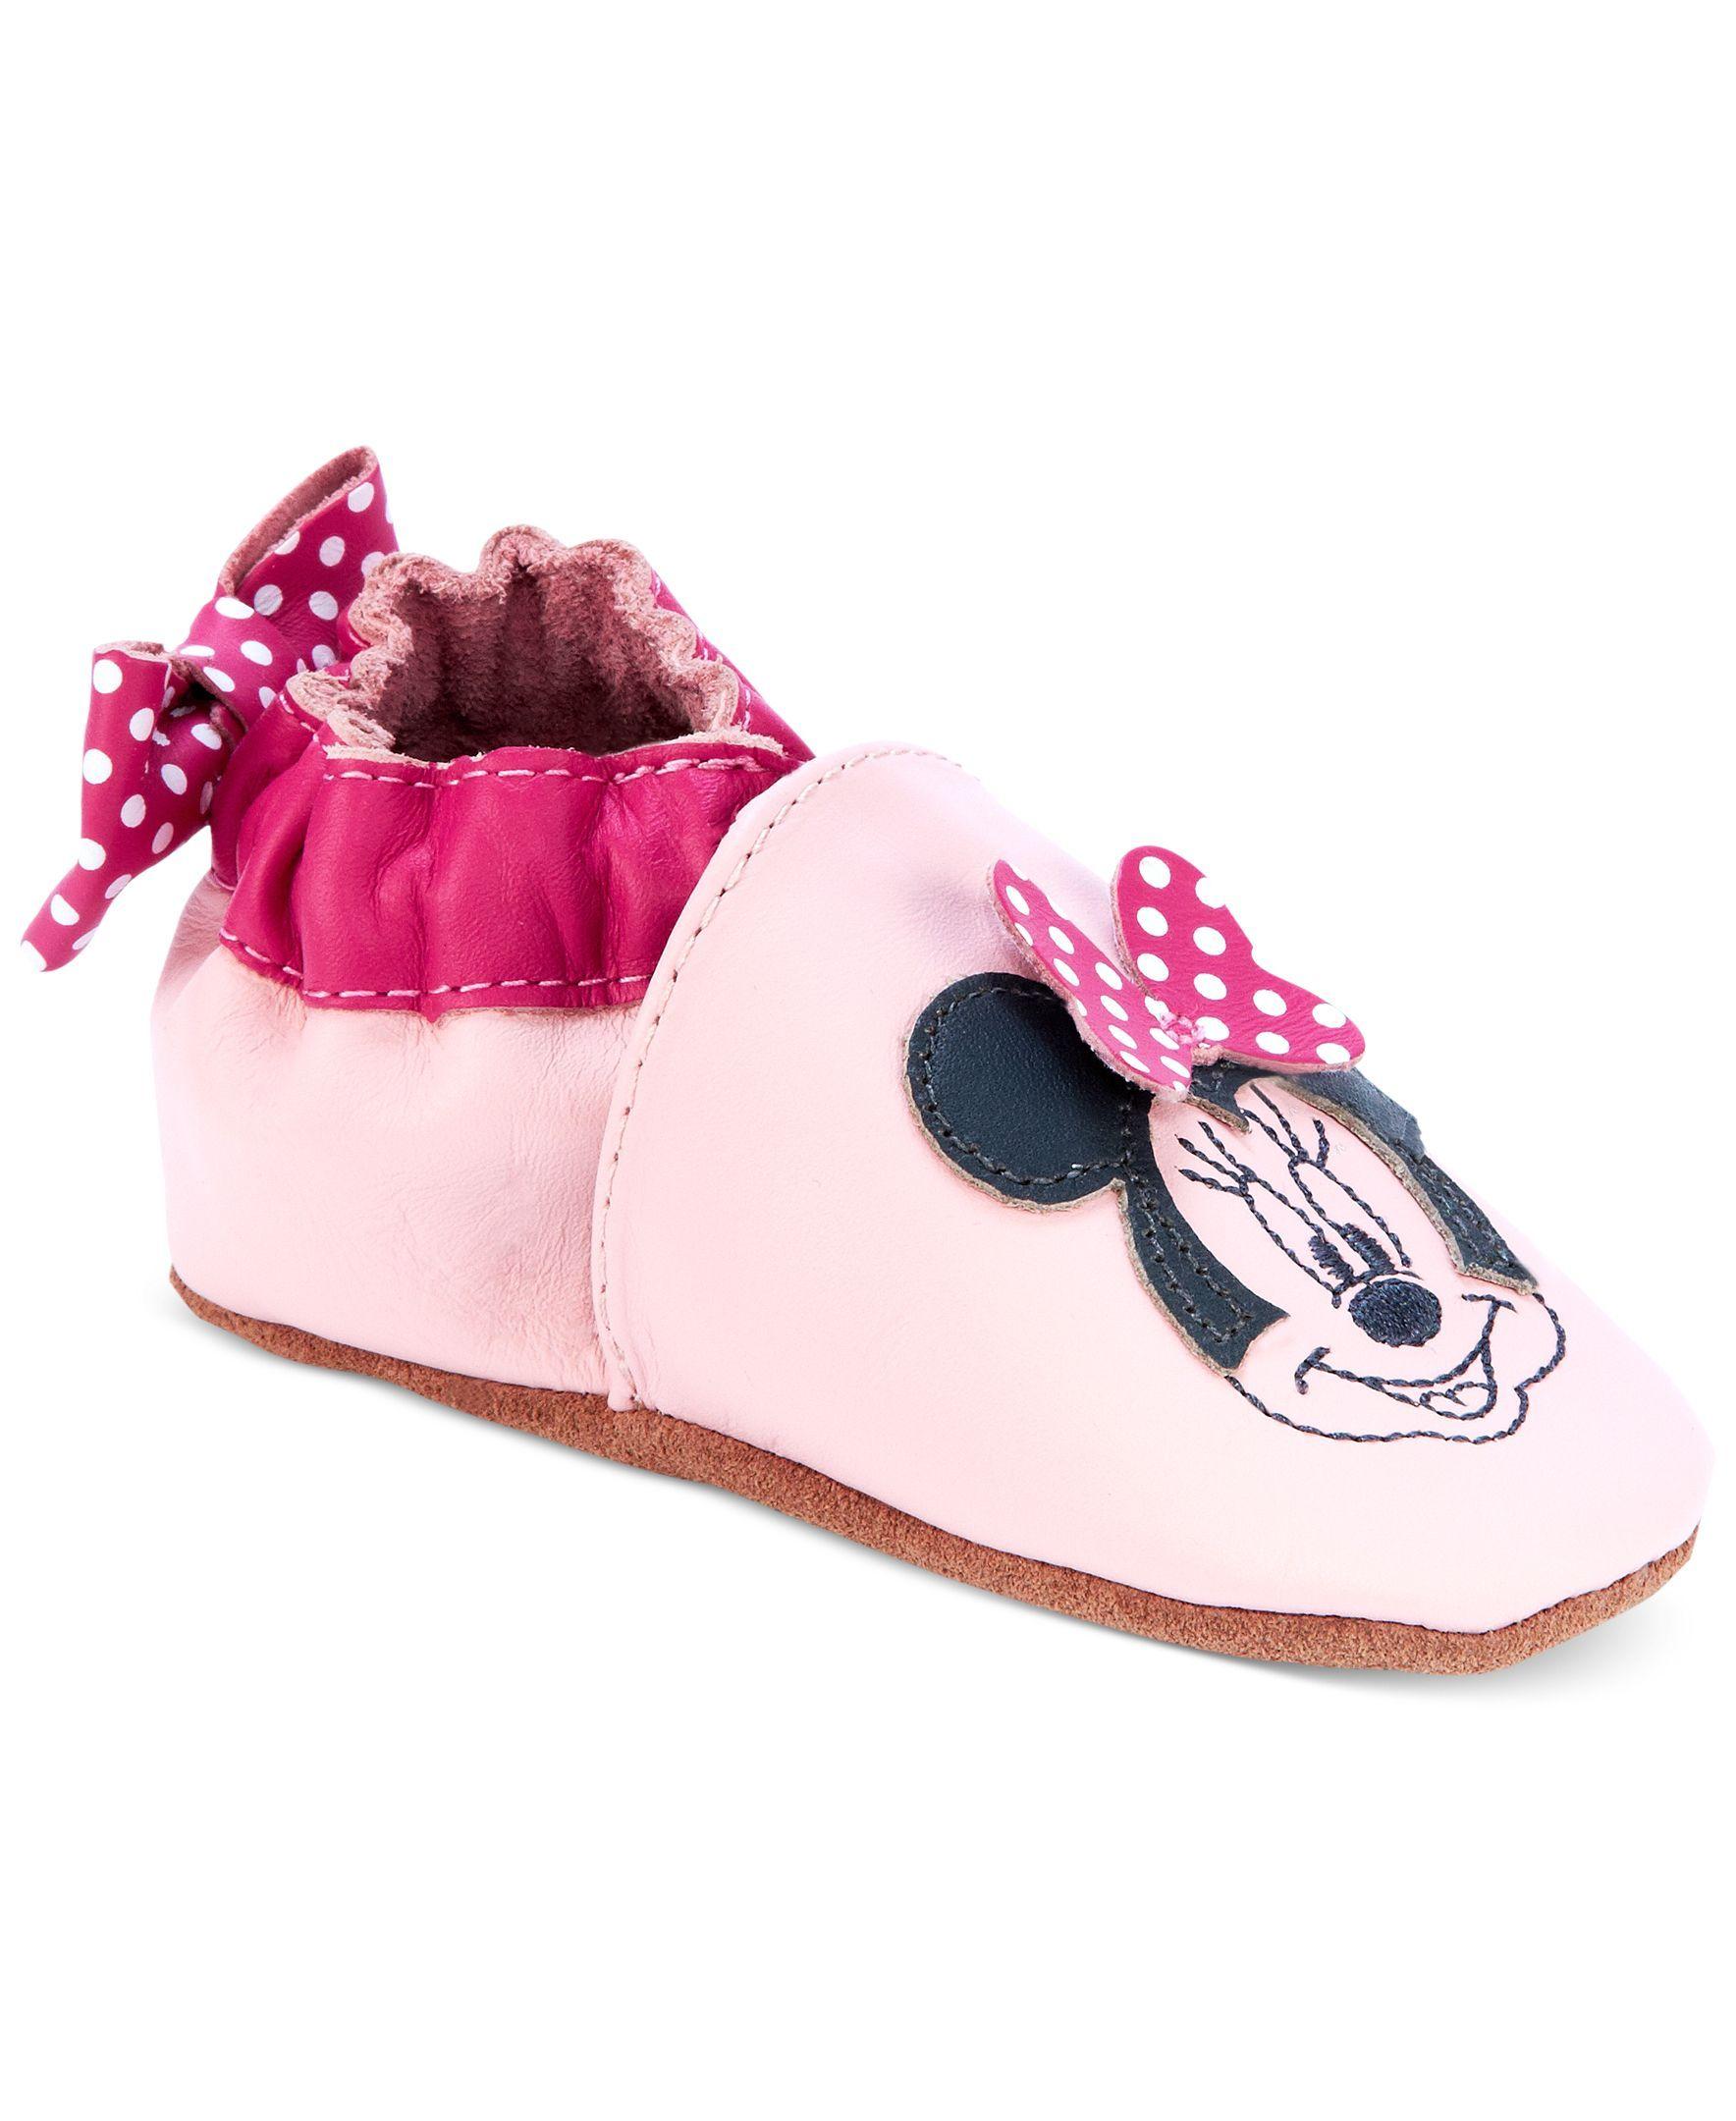 Robeez Baby Girls' Disney Minnie Mouse